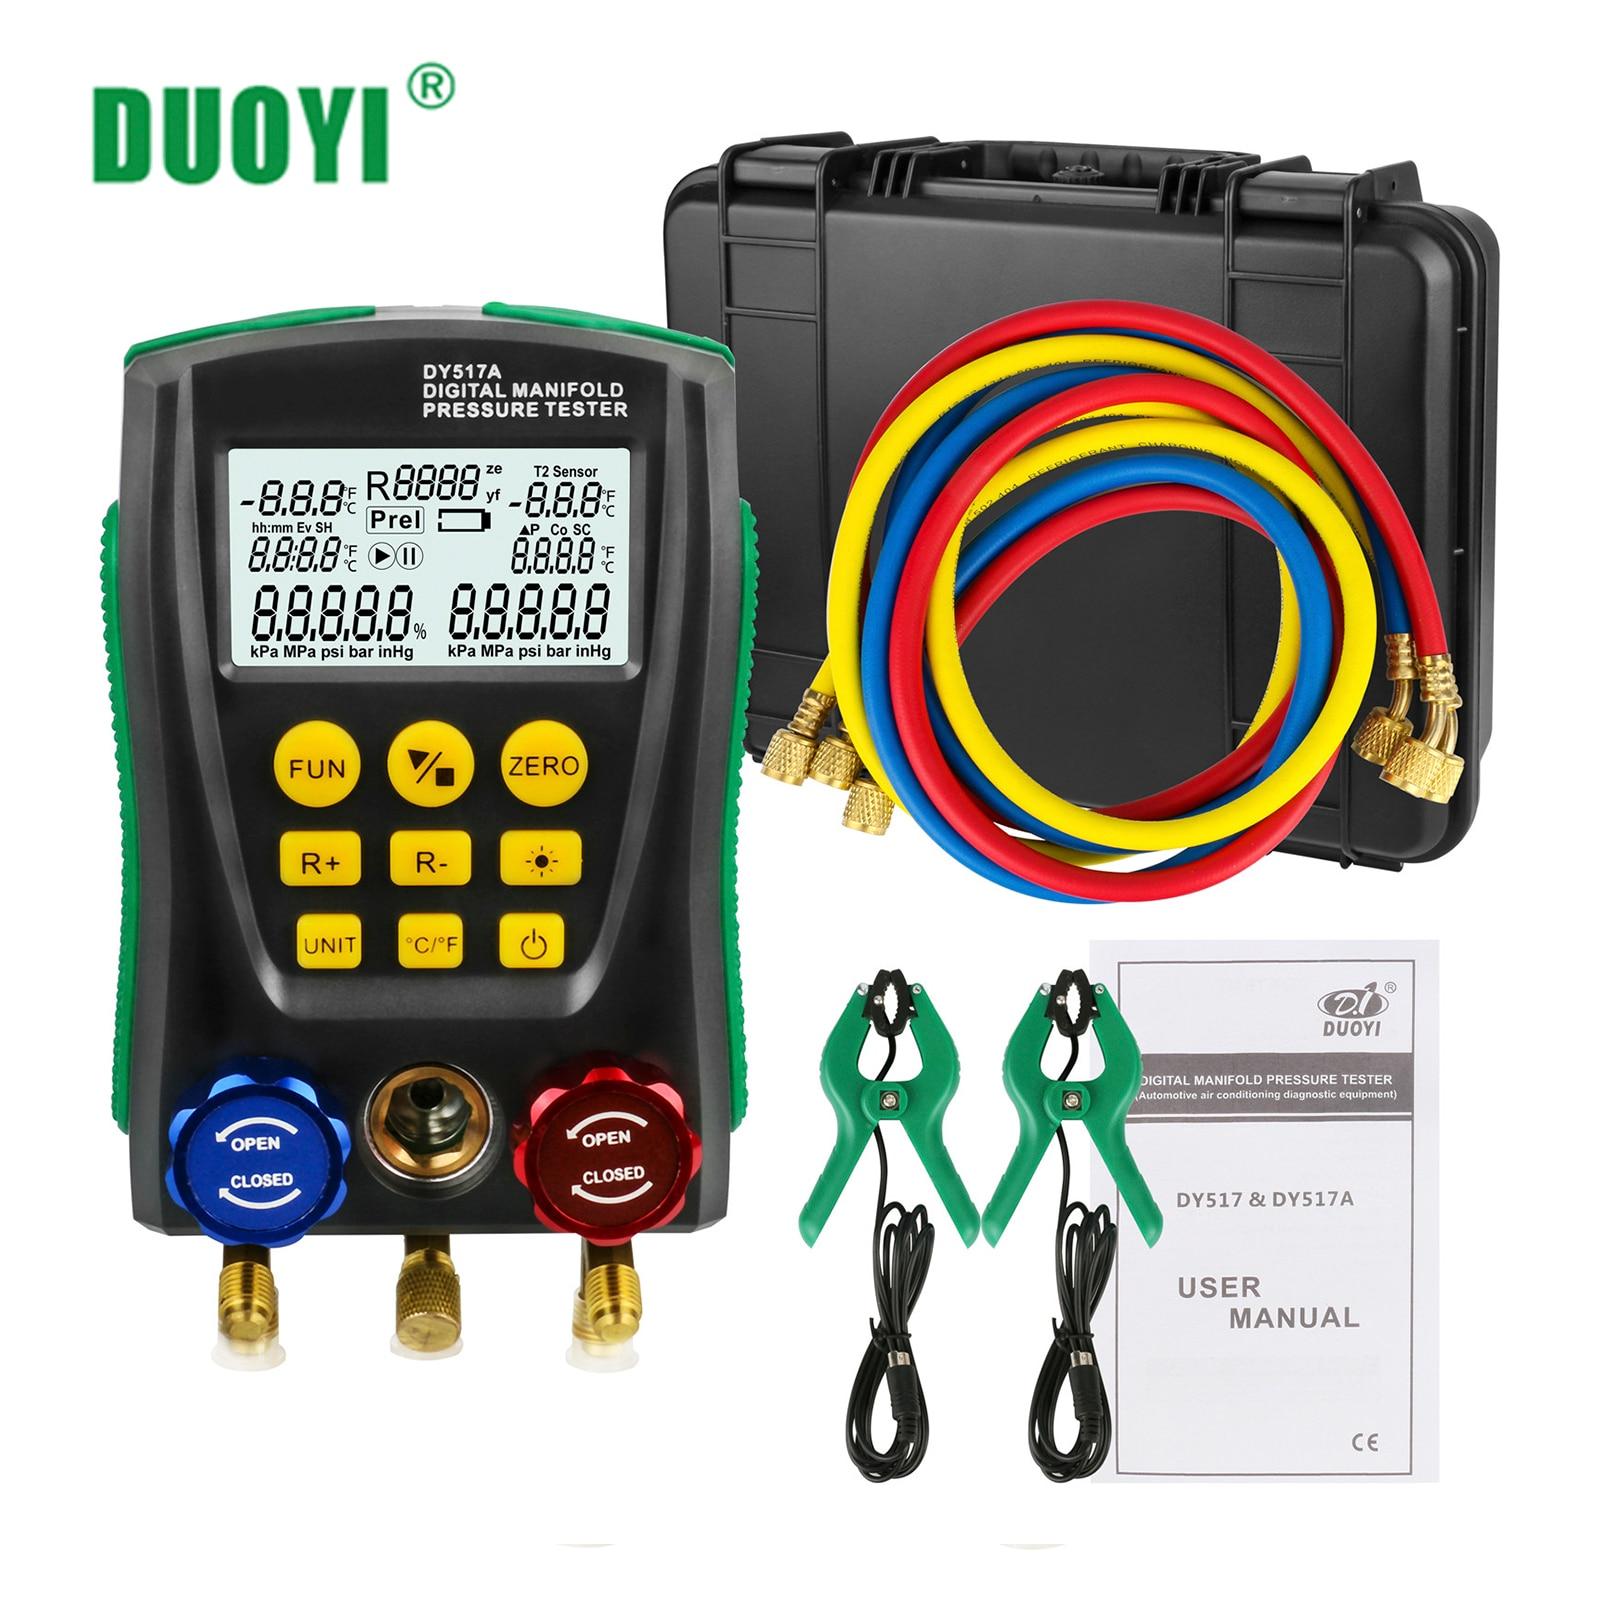 DUOYI Refrigeration Digital R410a Manifold Pressure Gauge Vacuum Pressure Temperature Meter Test Air-Conditioning PK TESTO 550